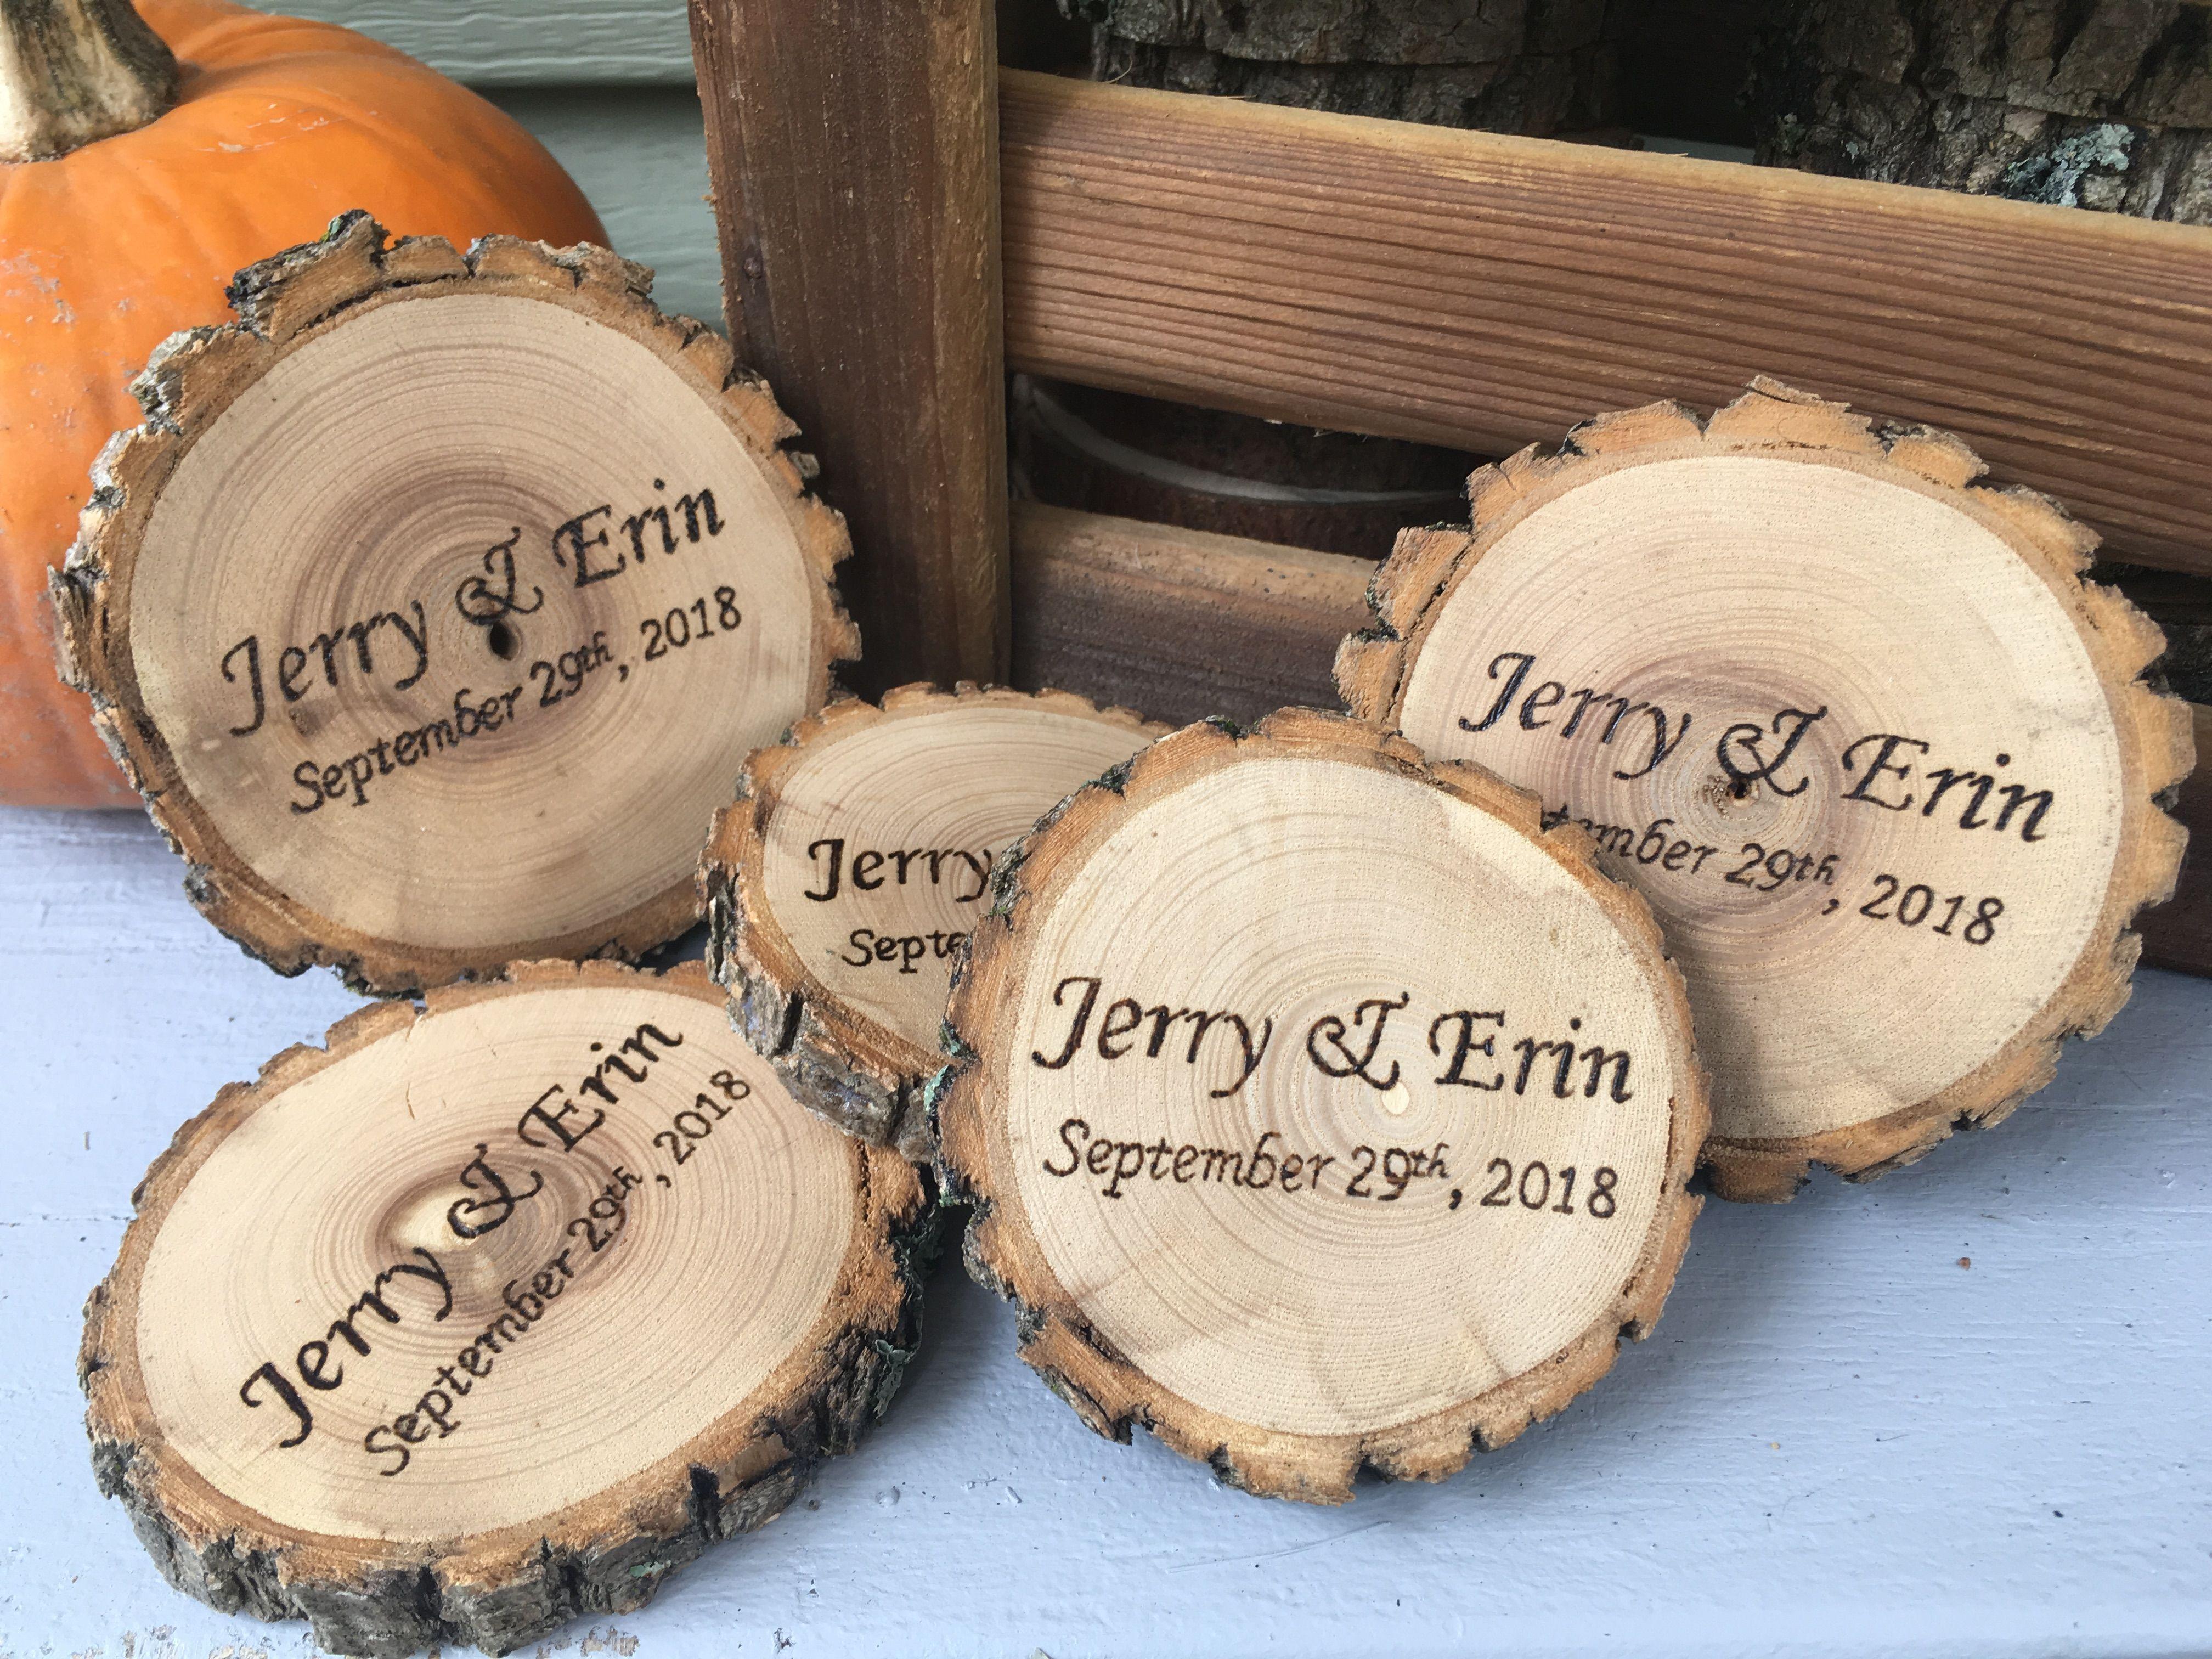 Wood Slice Coaster Wedding Favours Wood Burned Handmade Canada Differentweddingfavours Homemade Wedding Favors Wedding Favors Inexpensive Wedding Favors